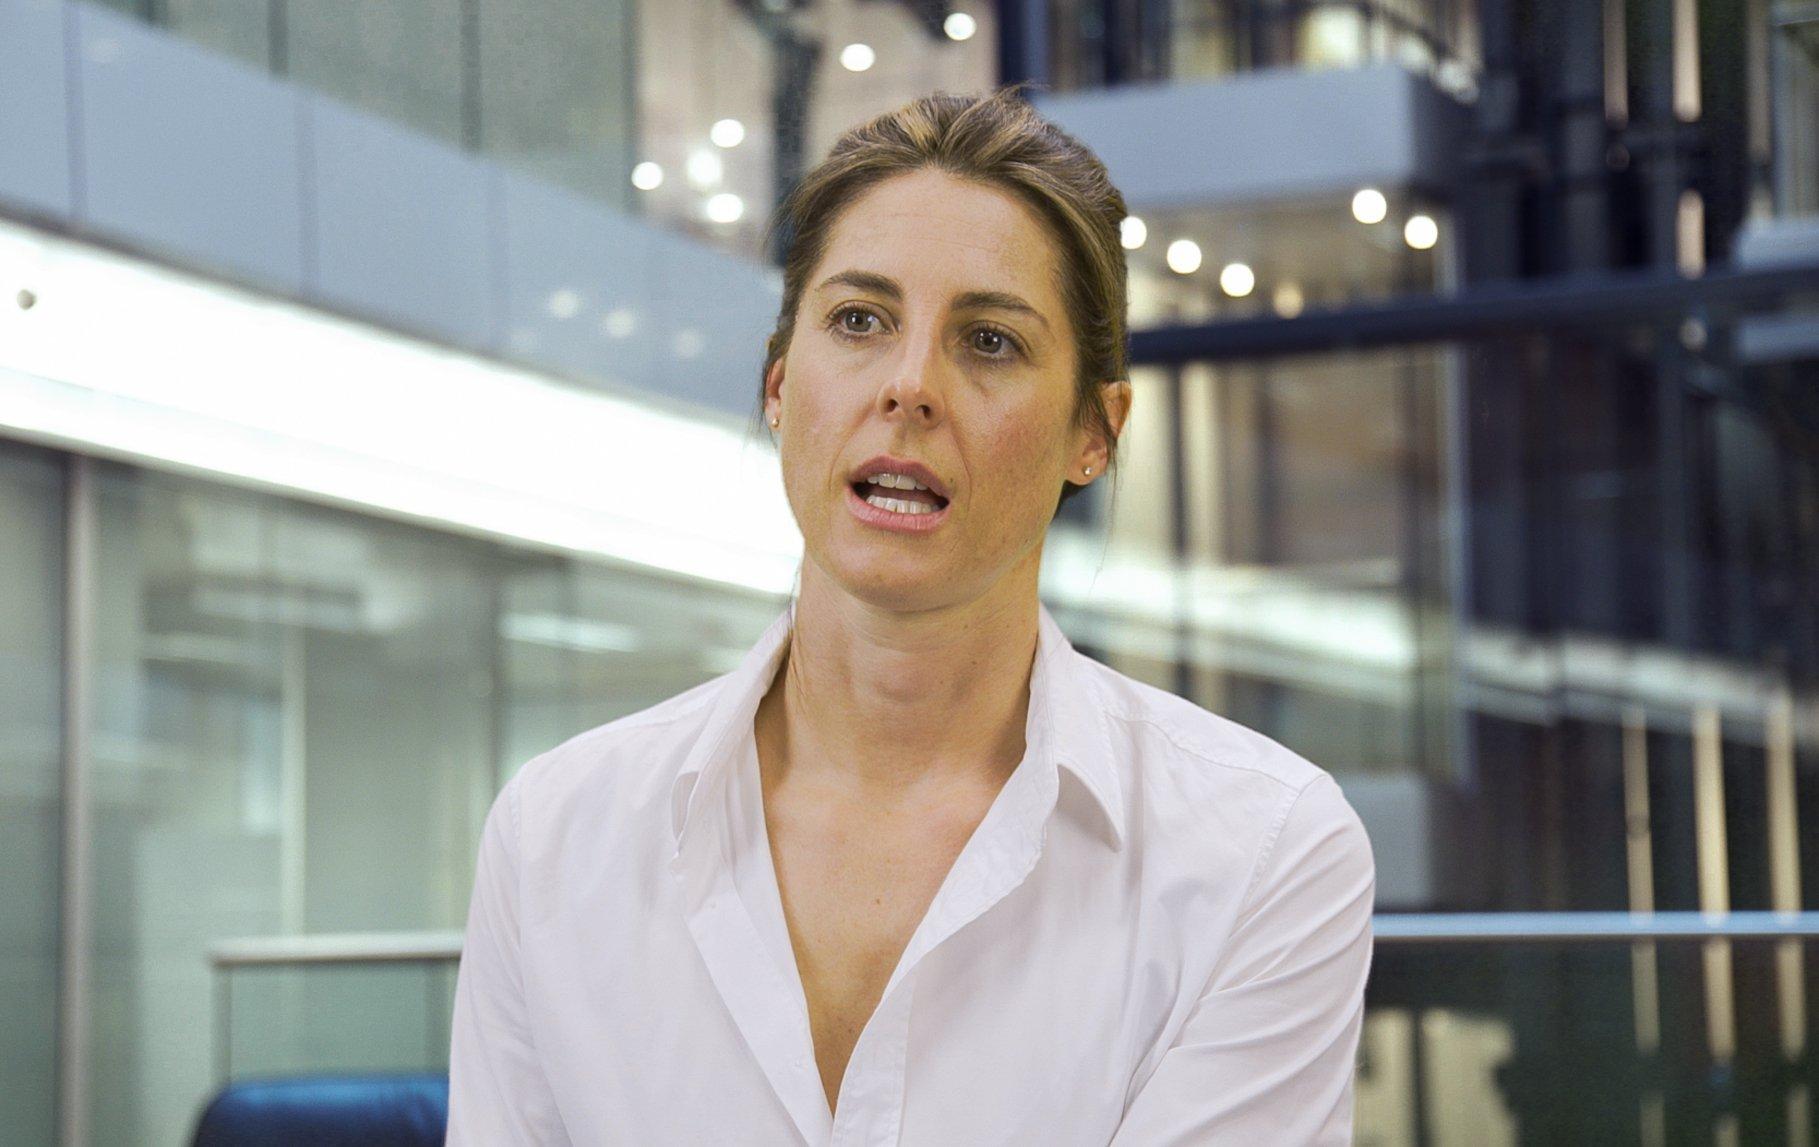 Dr Anna Fitzgerald